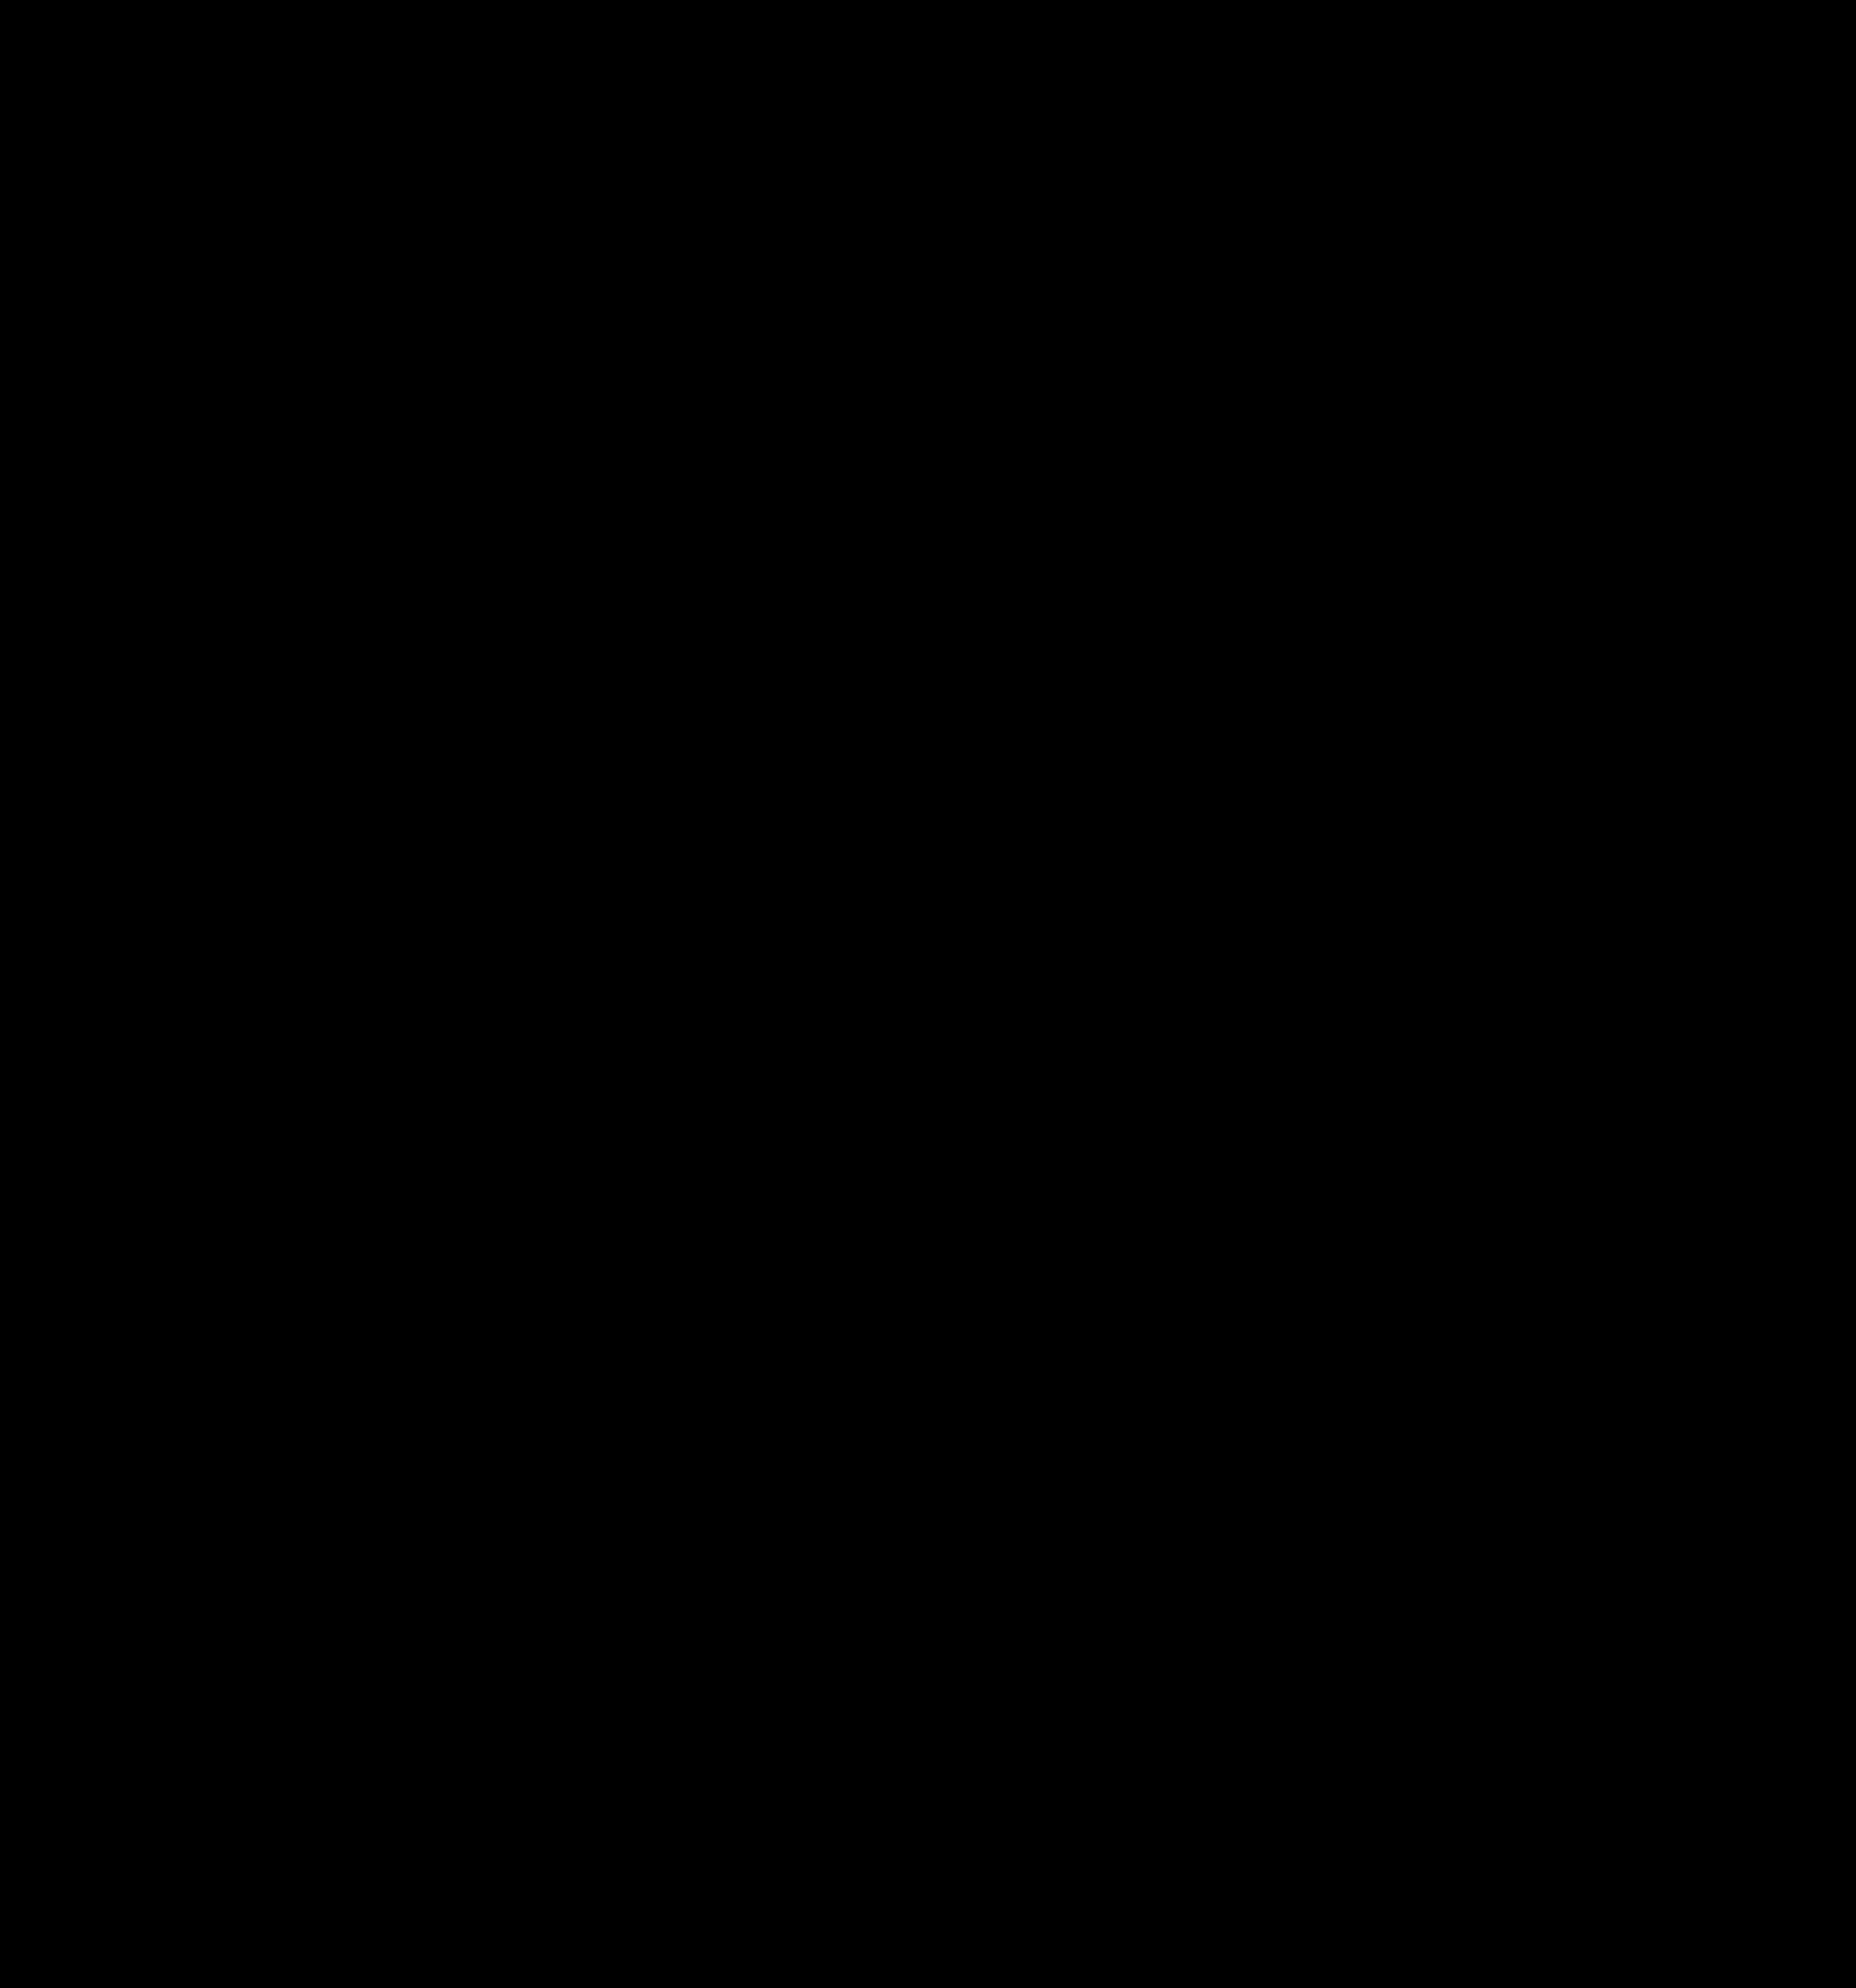 jpg black and white download warthog drawing evil #108993348